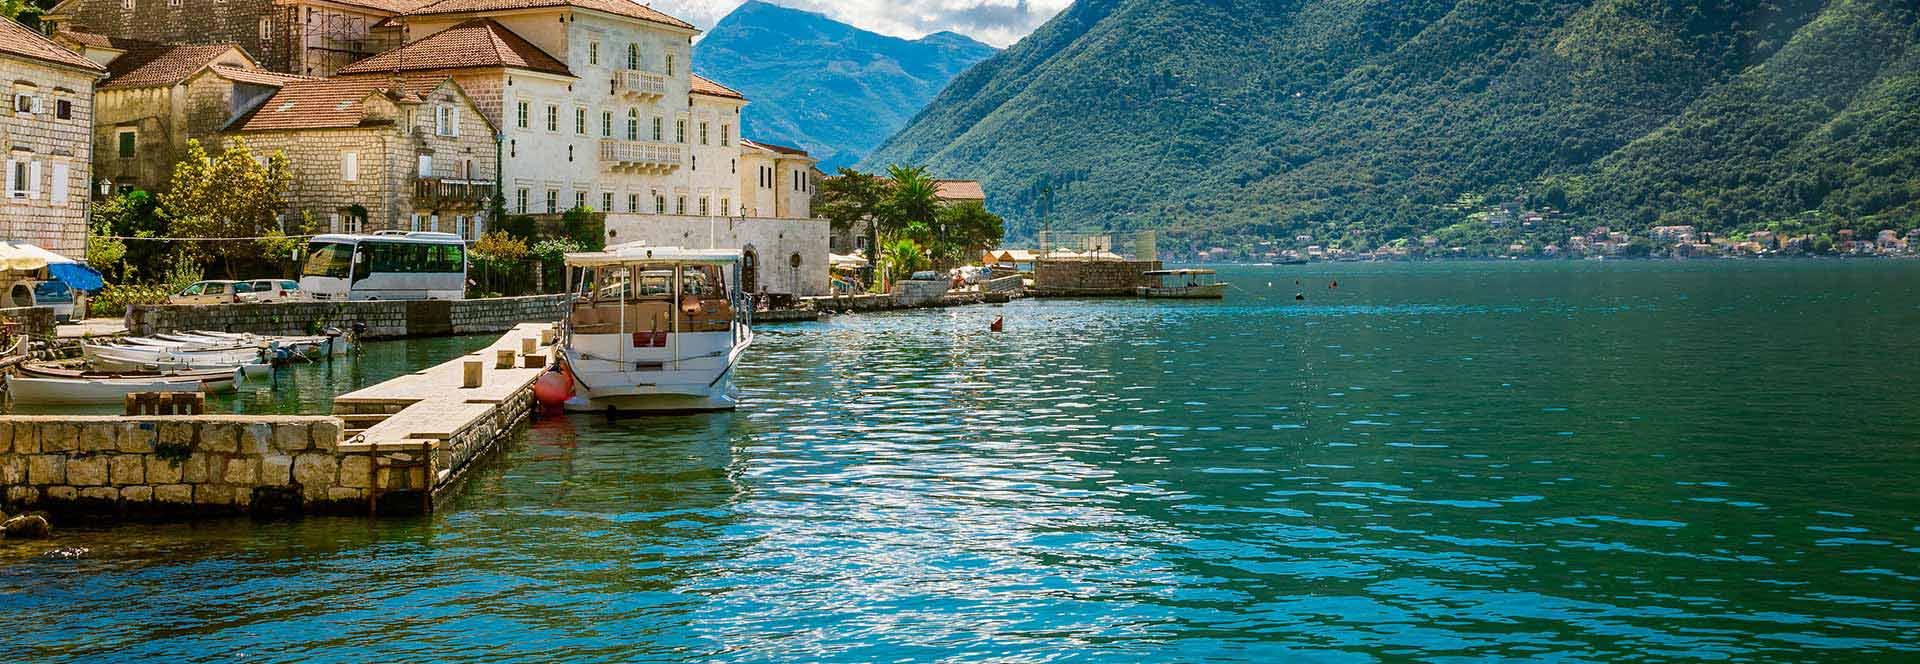 Montenegro vacations. Vacations & vacations in Montenegro ...